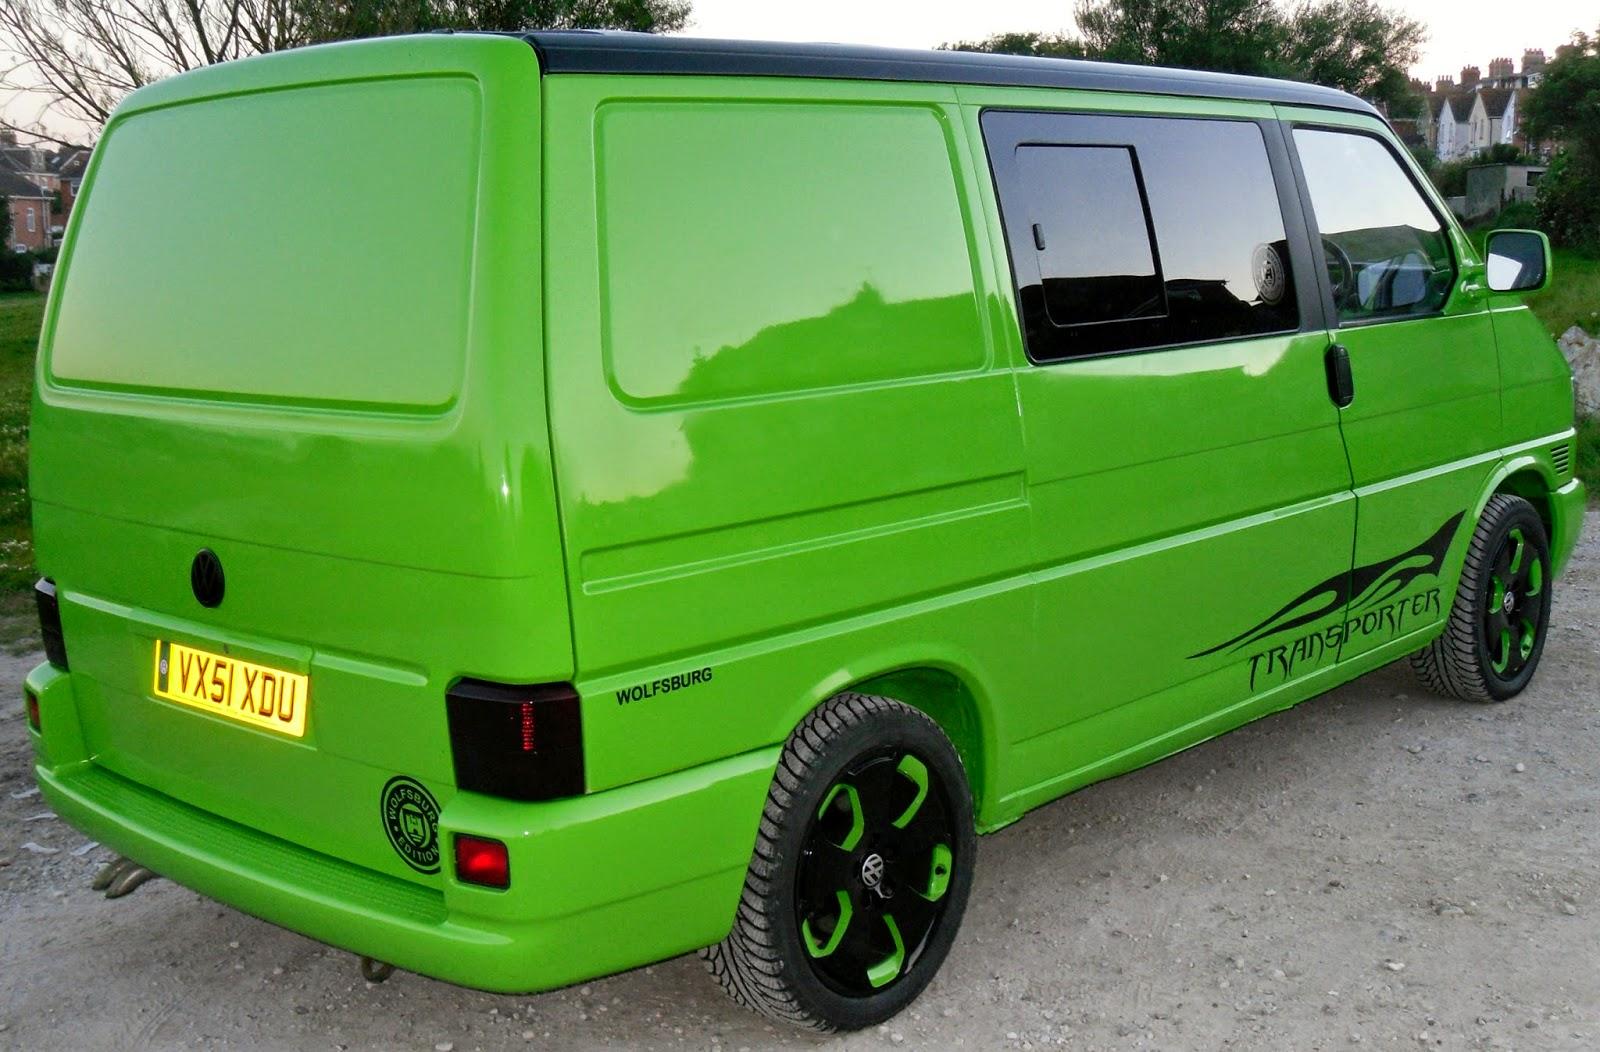 Soul'd out: VW camper